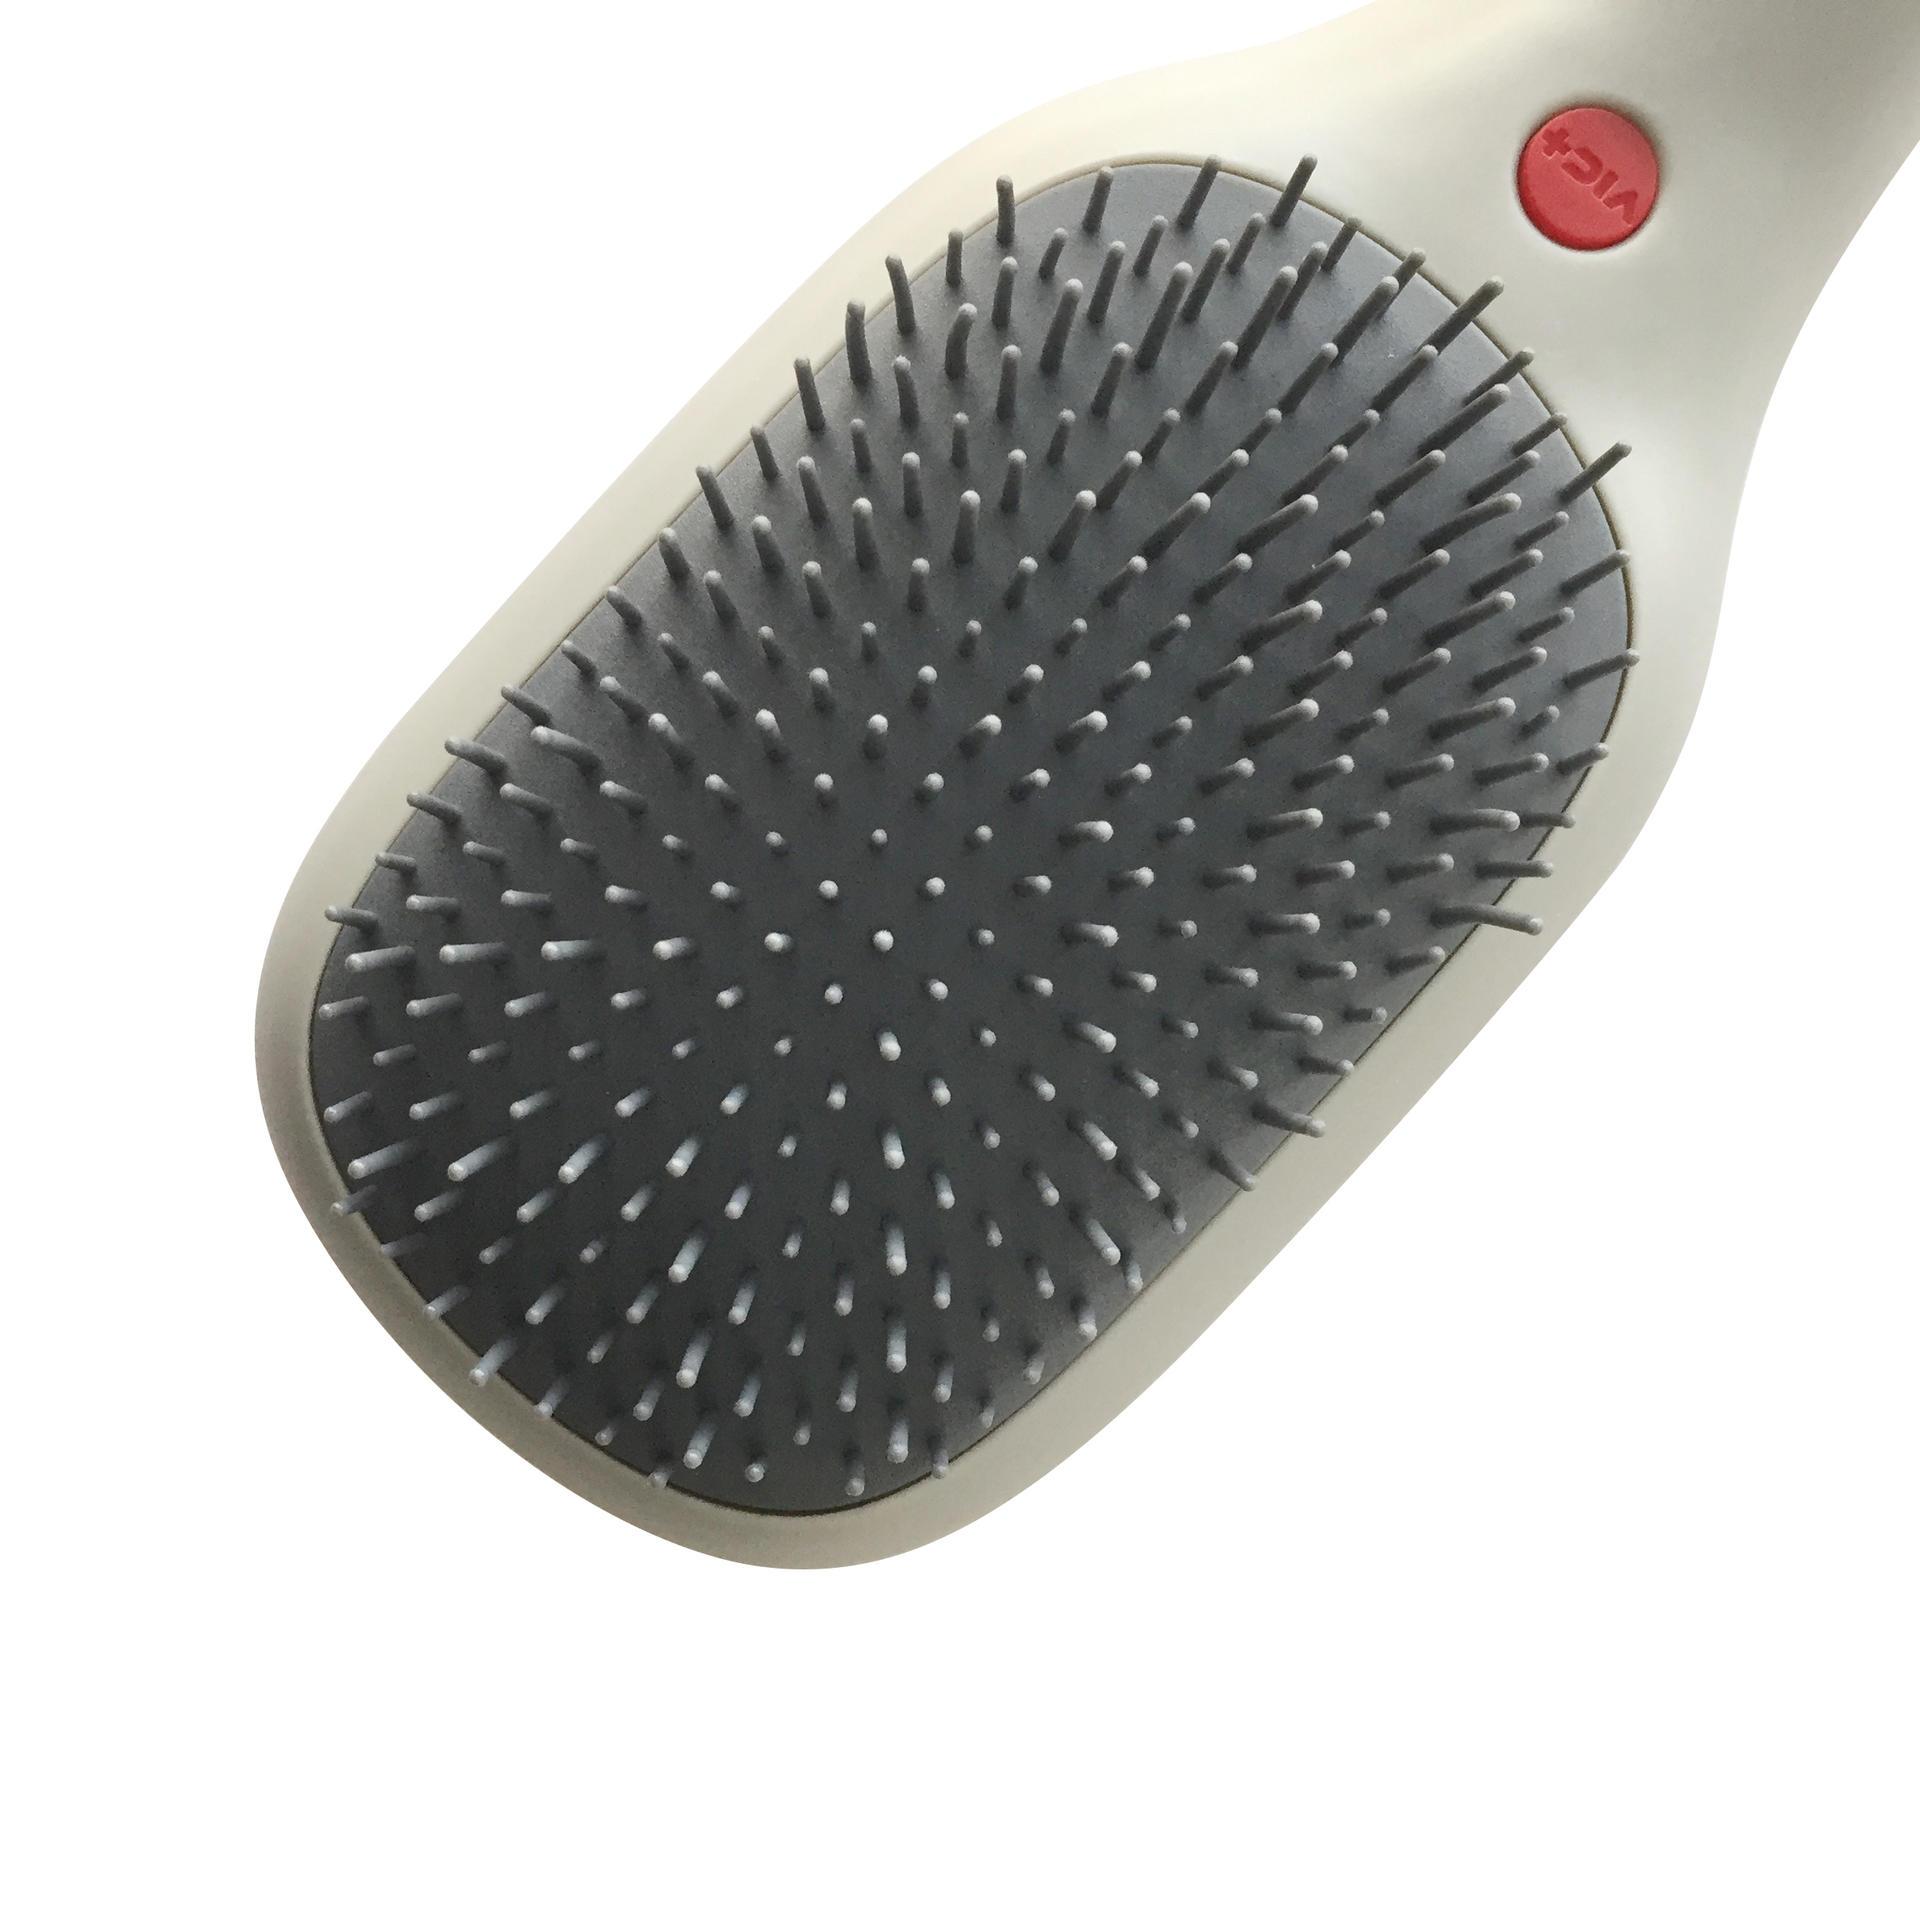 Wholesale salon hair extension comb hair tangled bristle tangle hair brush